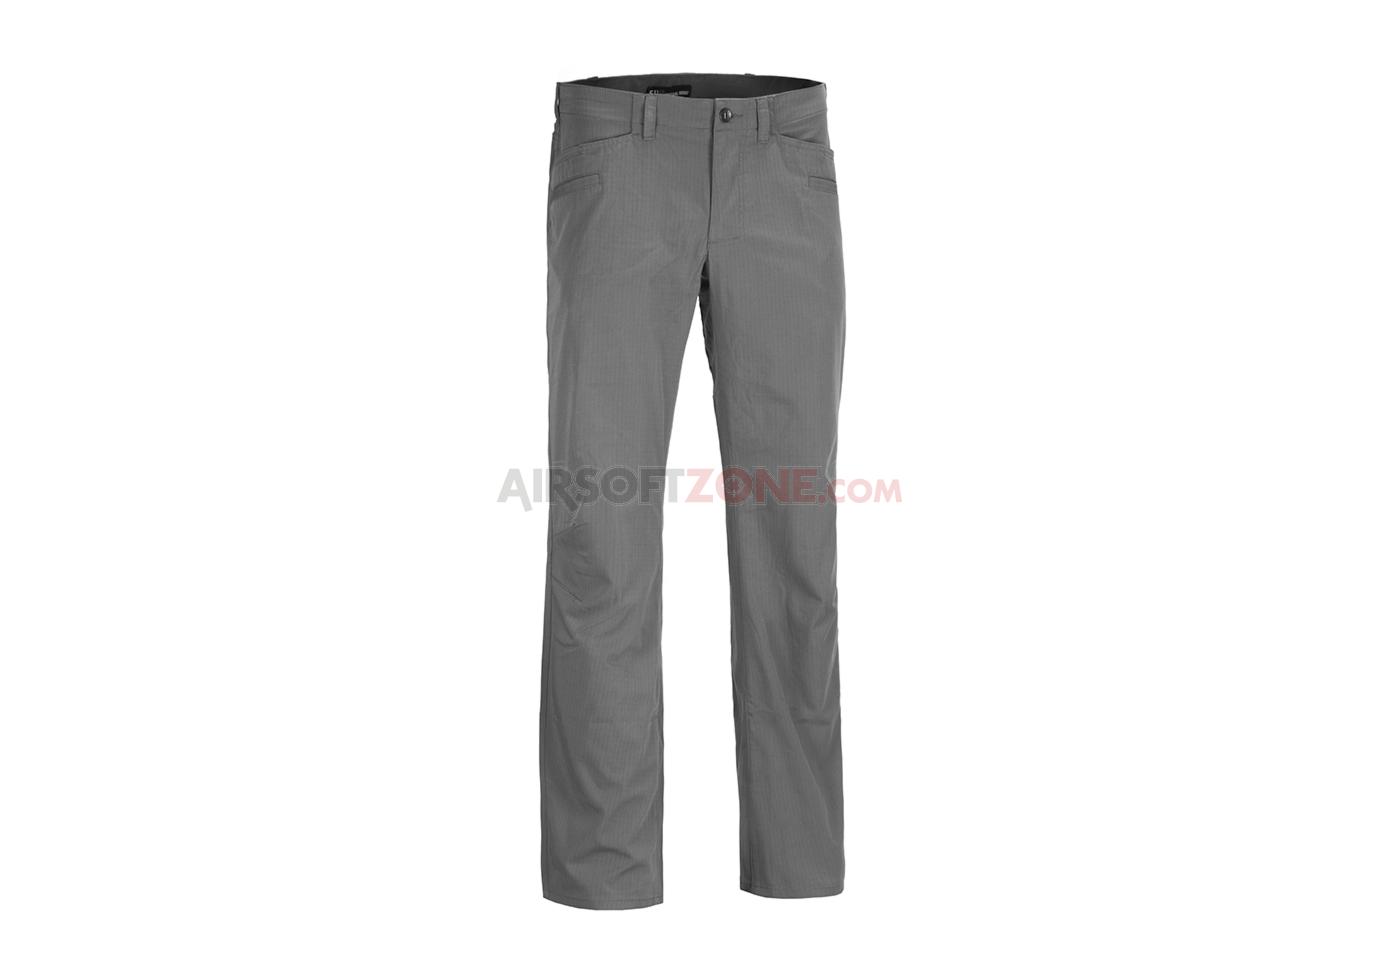 a0c71fe5 Ridgeline Pant Storm (5.11 Tactical) 32L - Tactical Pants - Pants ...